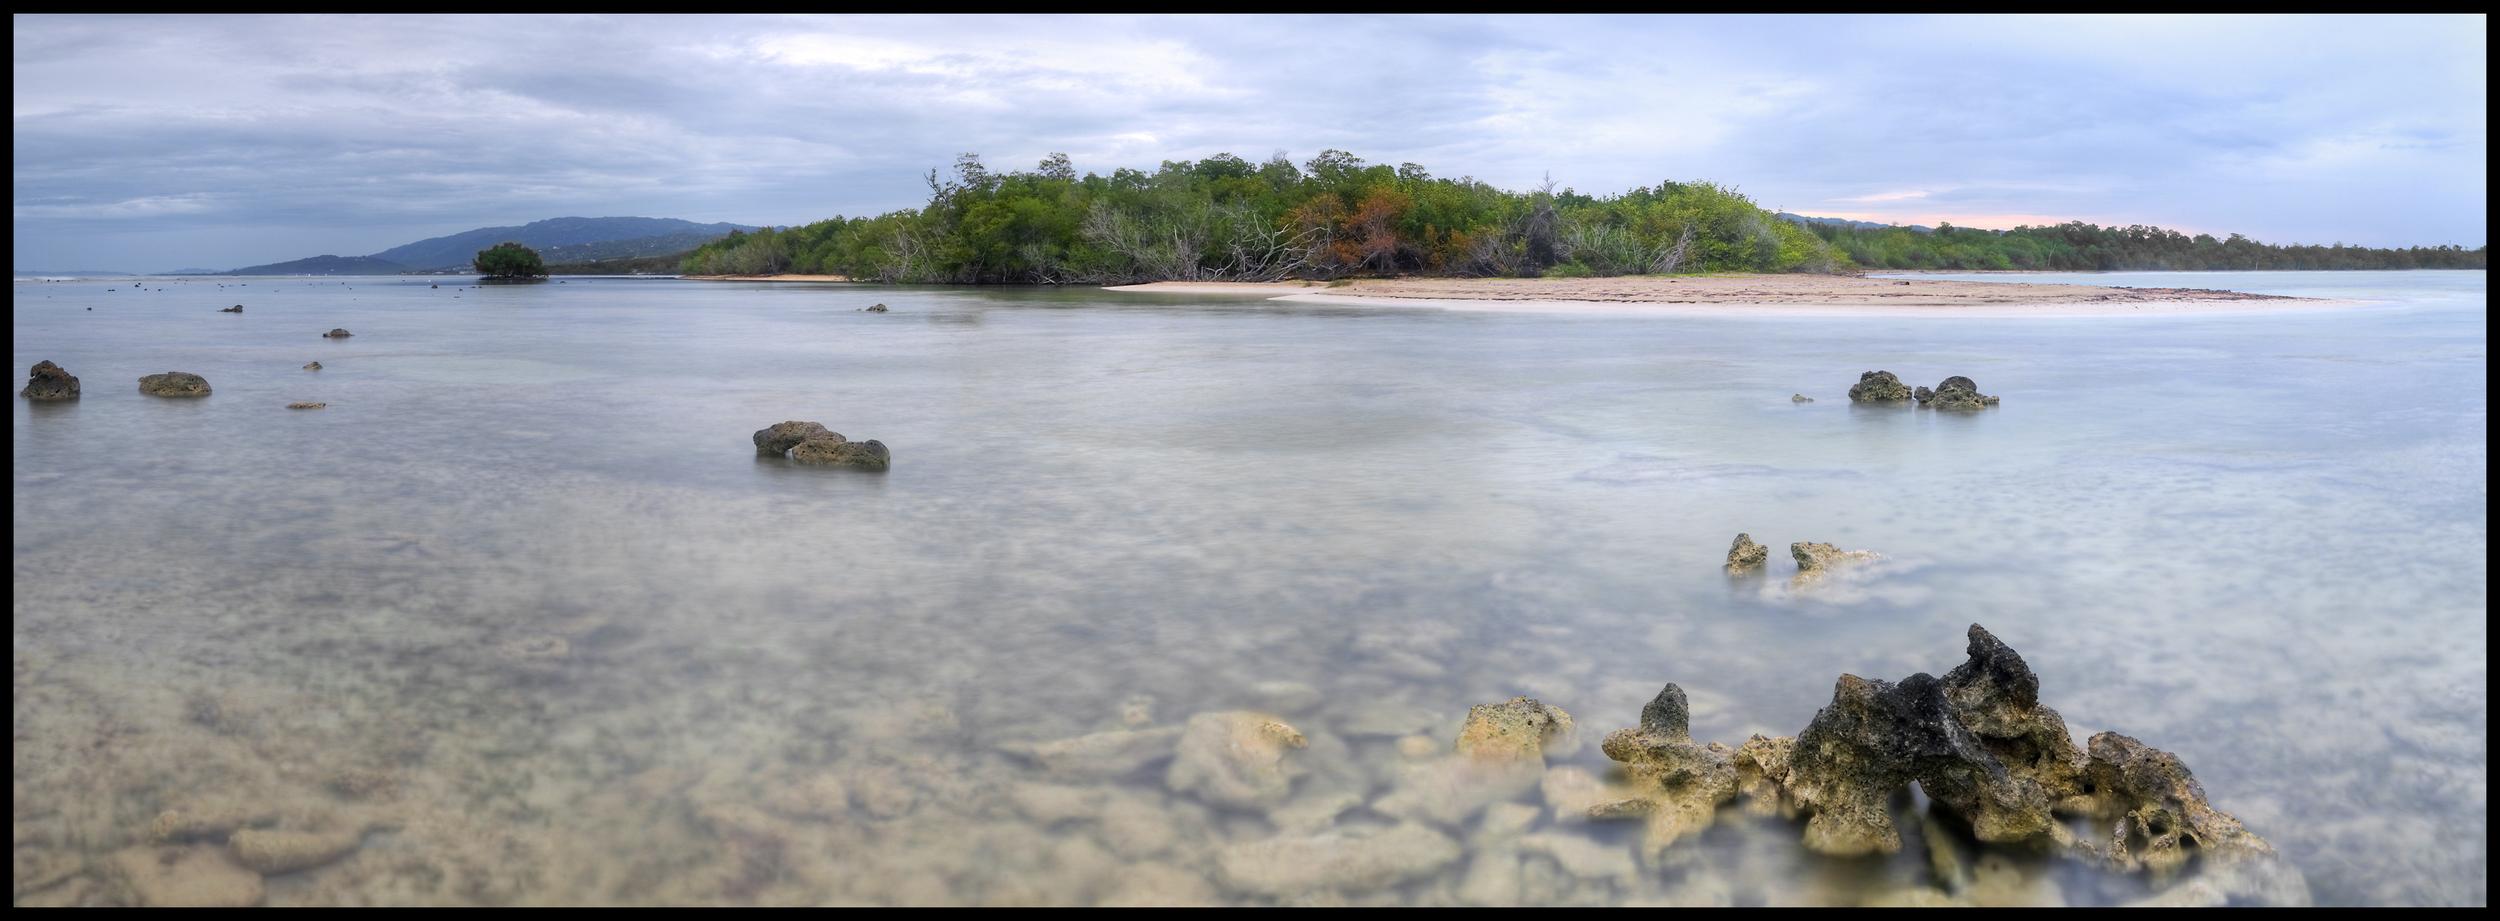 Luana Point, Font Hill Nature Preserve, Jamaica